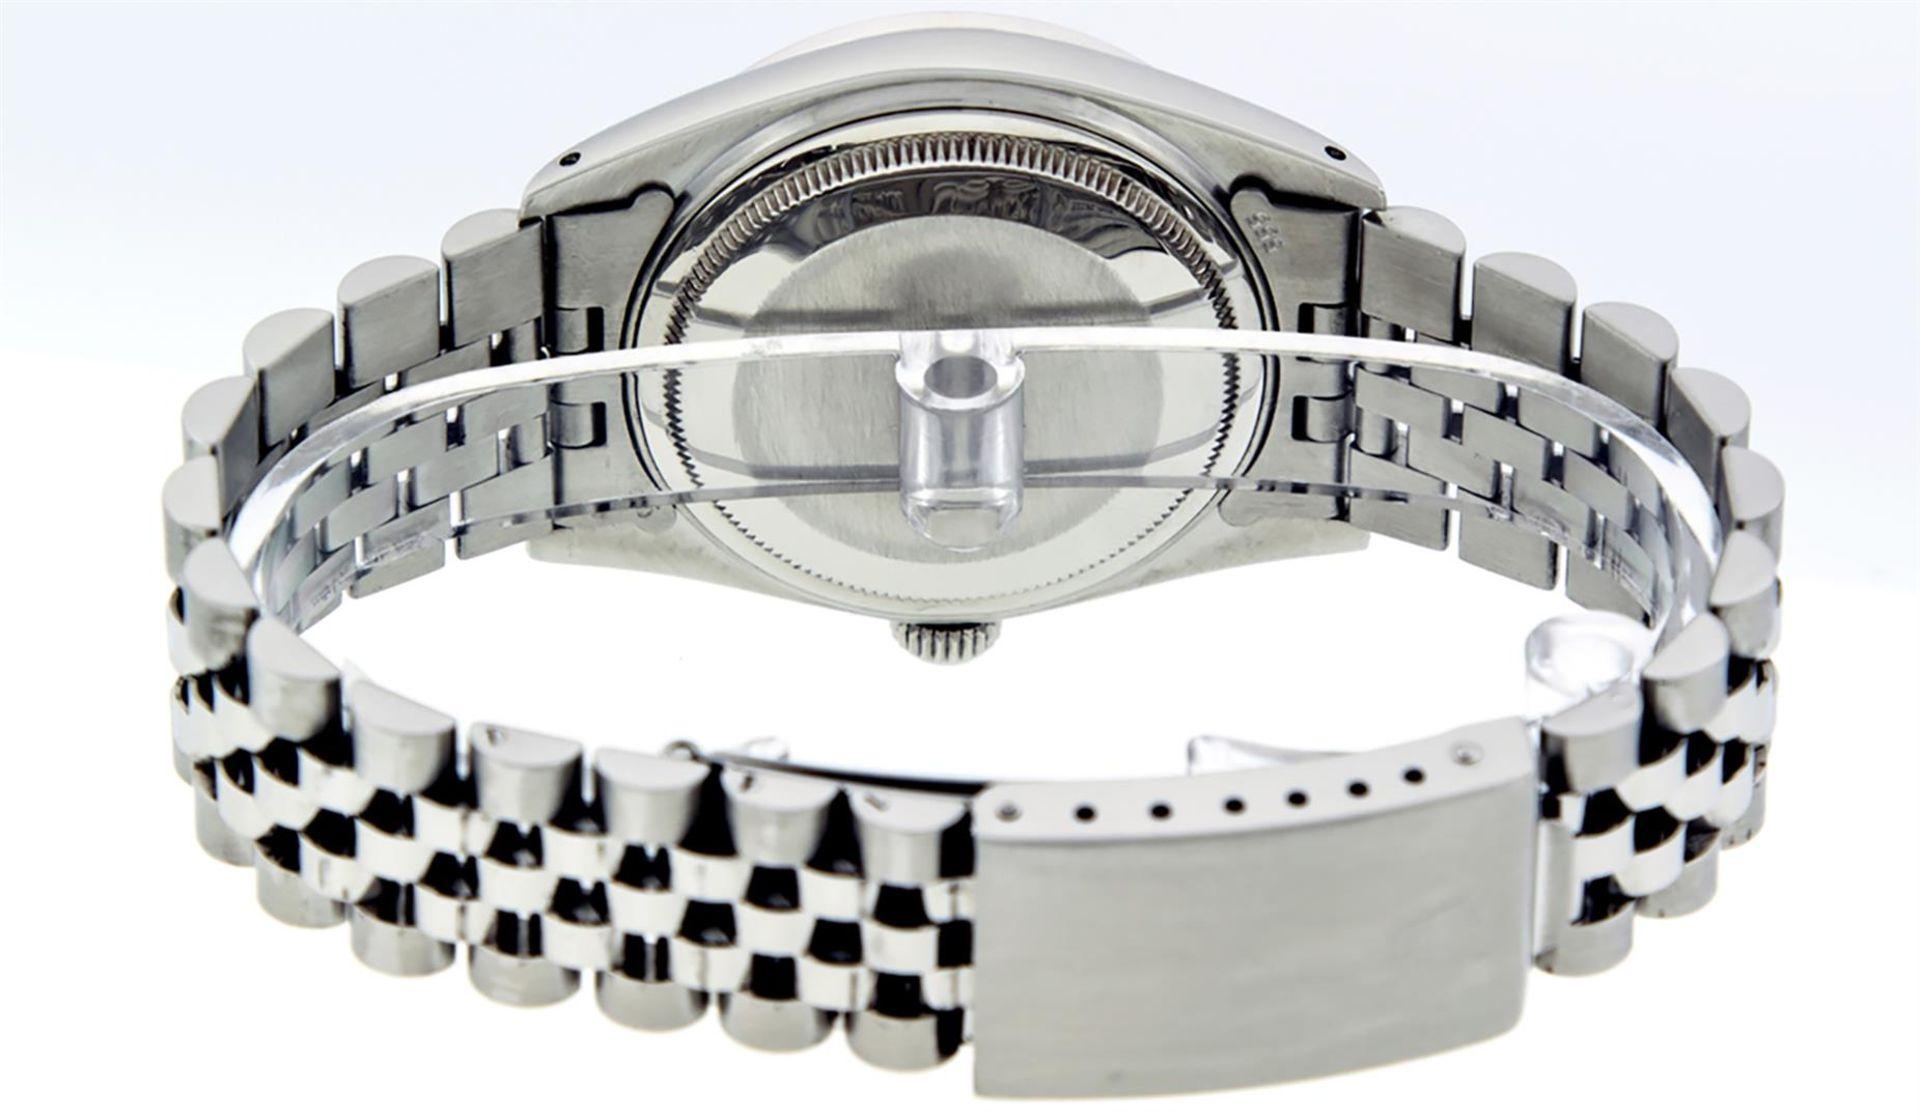 Rolex Mens Stainless Steel Diamond Lugs & Ruby Datejust Wristwatch - Image 6 of 8